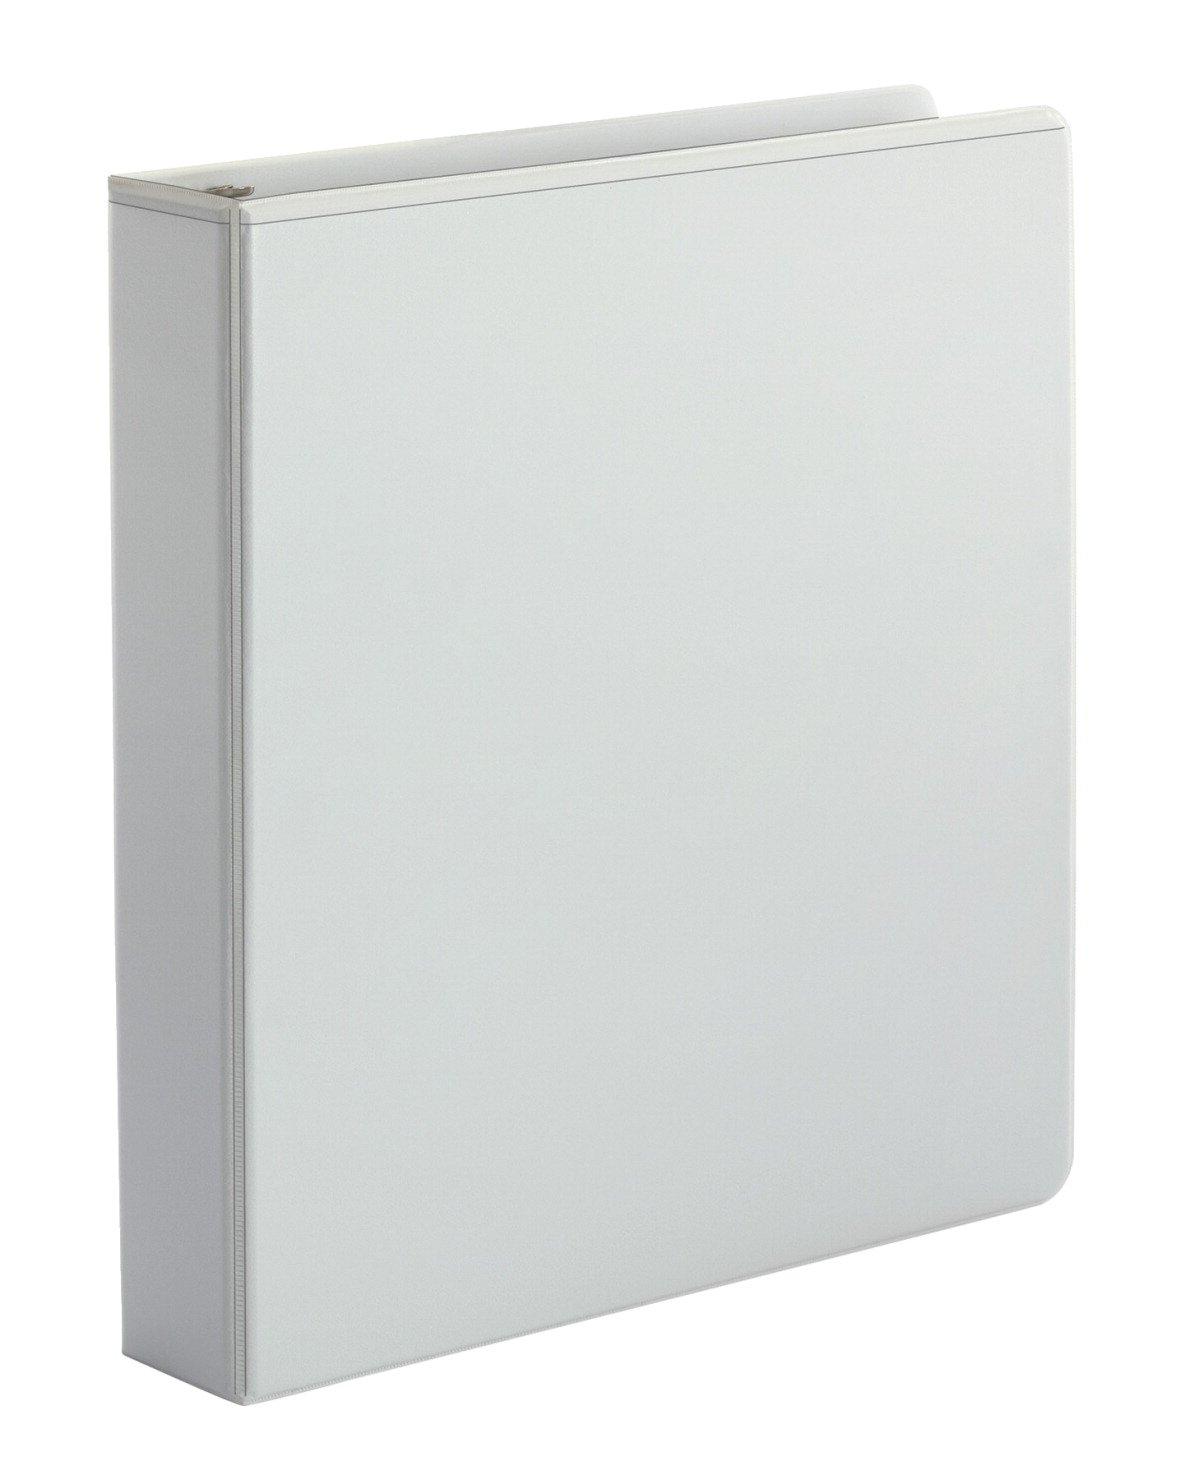 School Smart View Binder - 1 1/2 inches - White